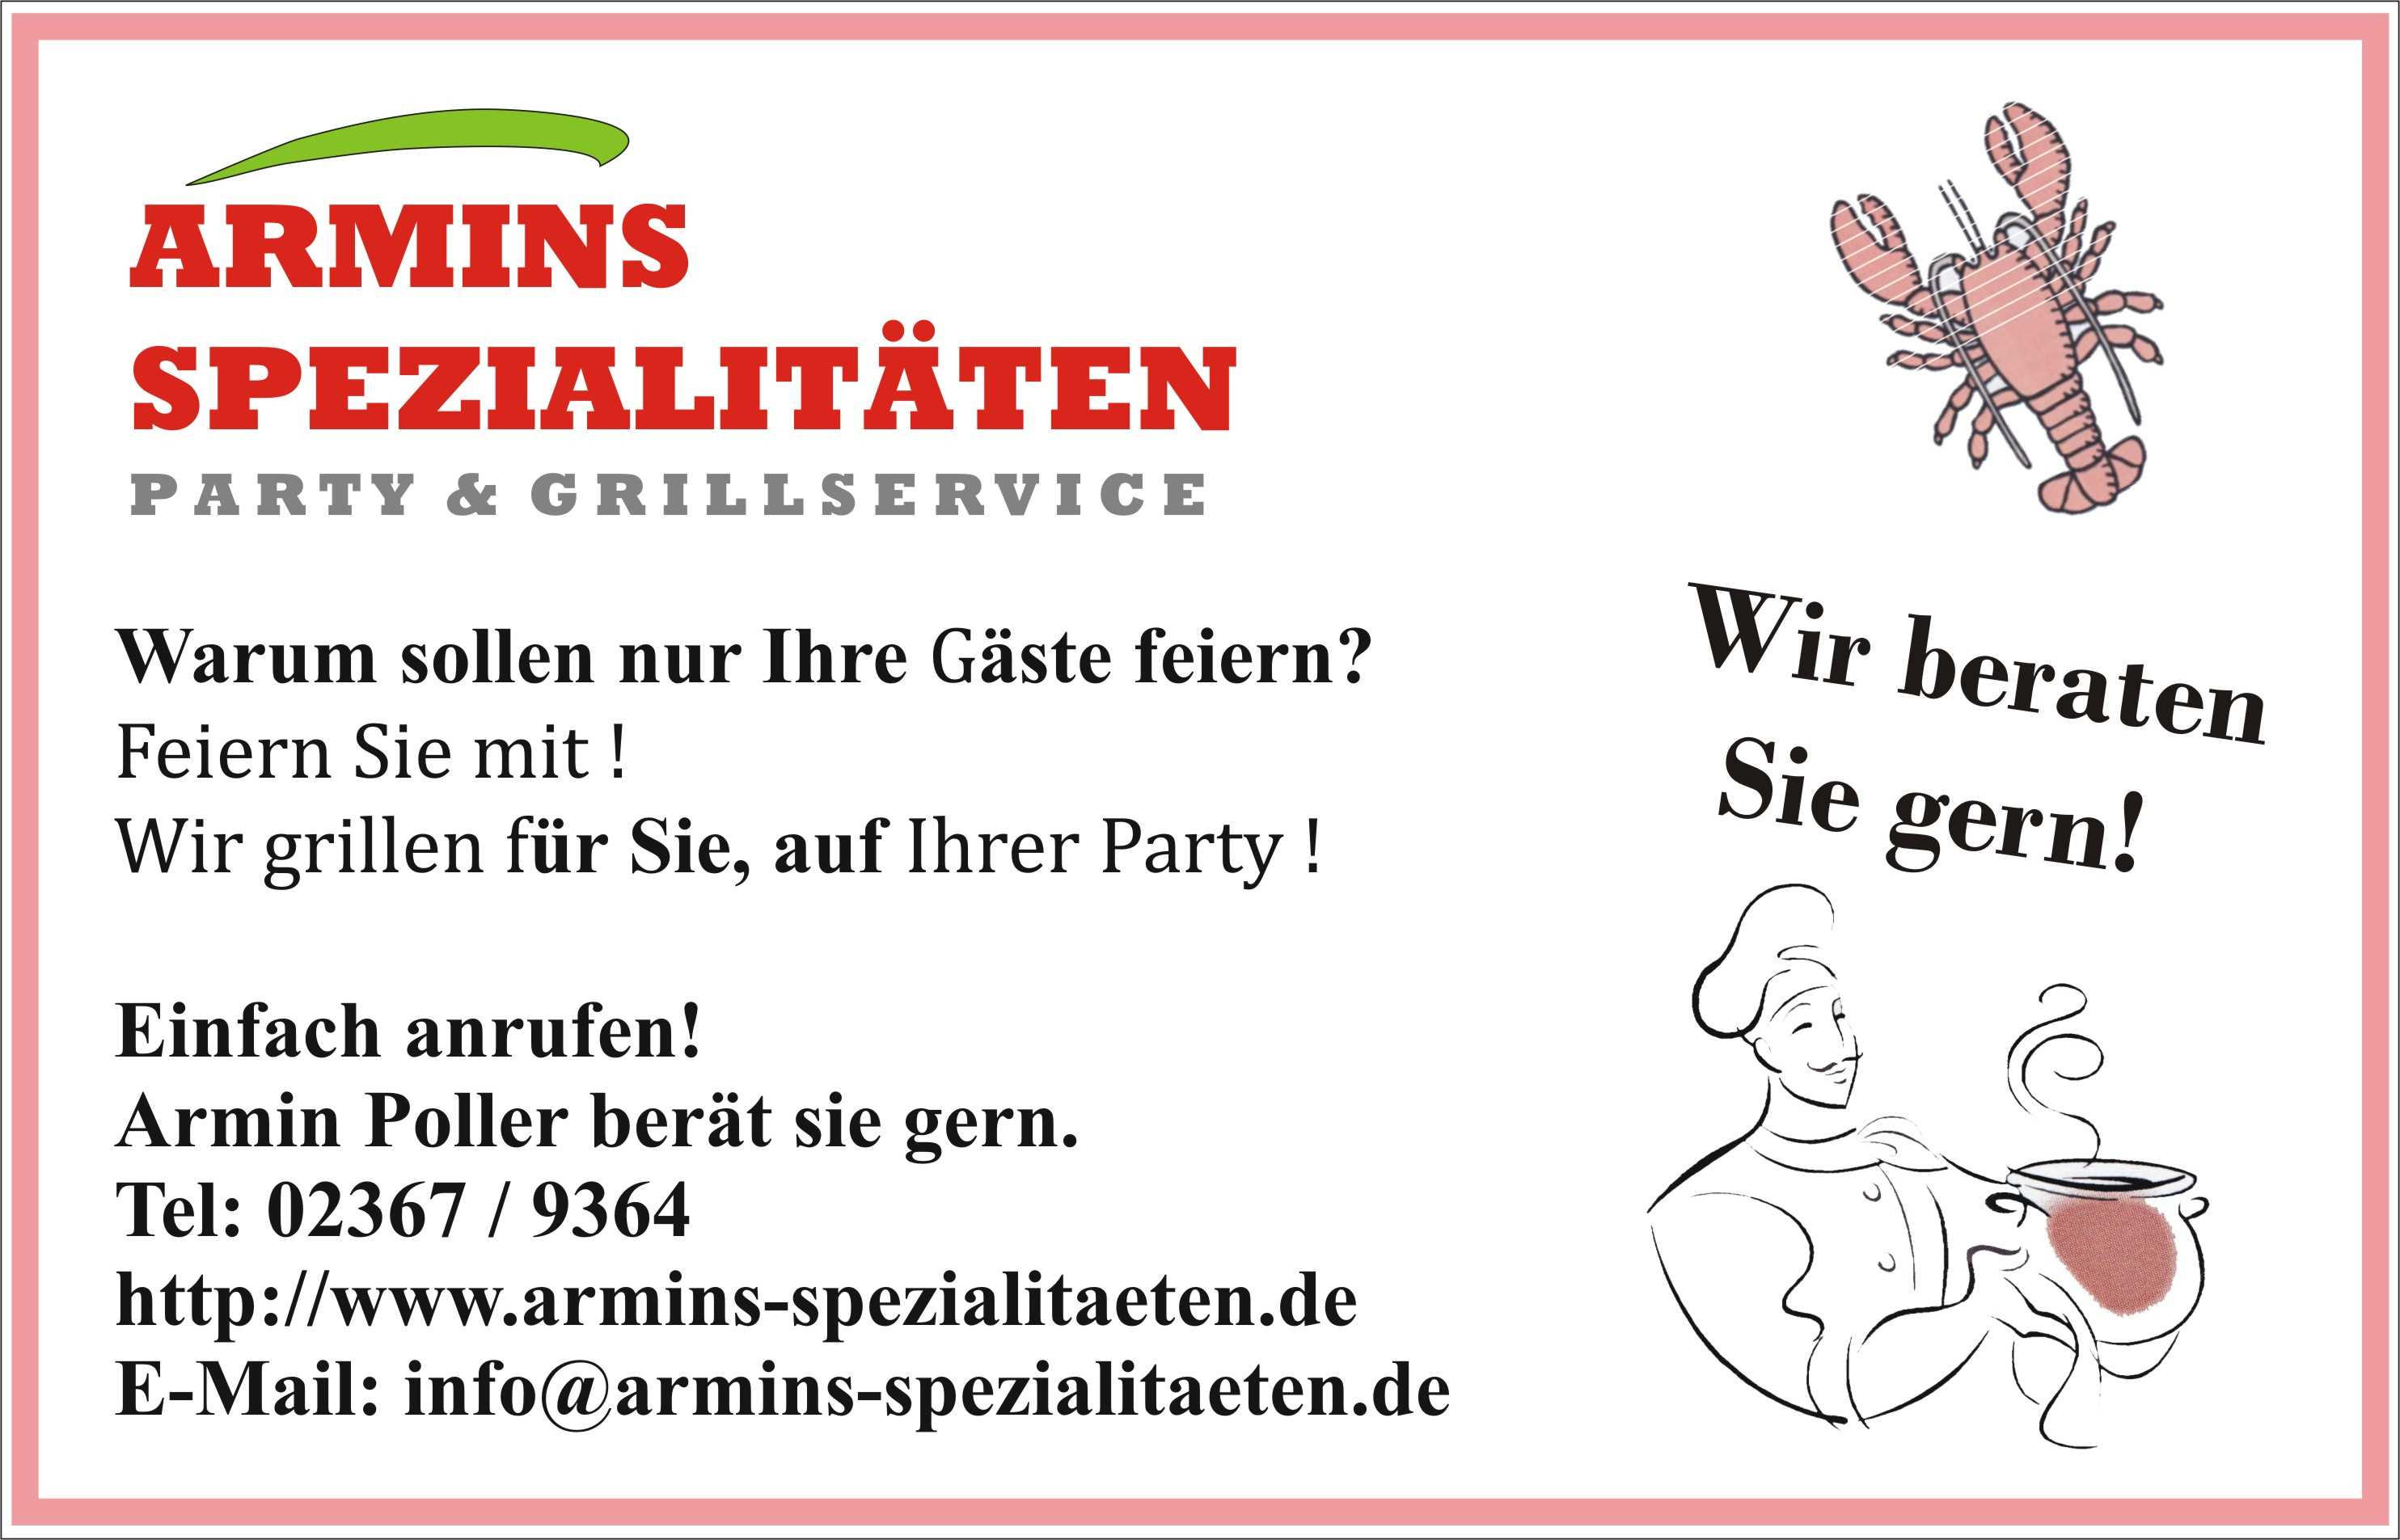 Armins Spezialitäten